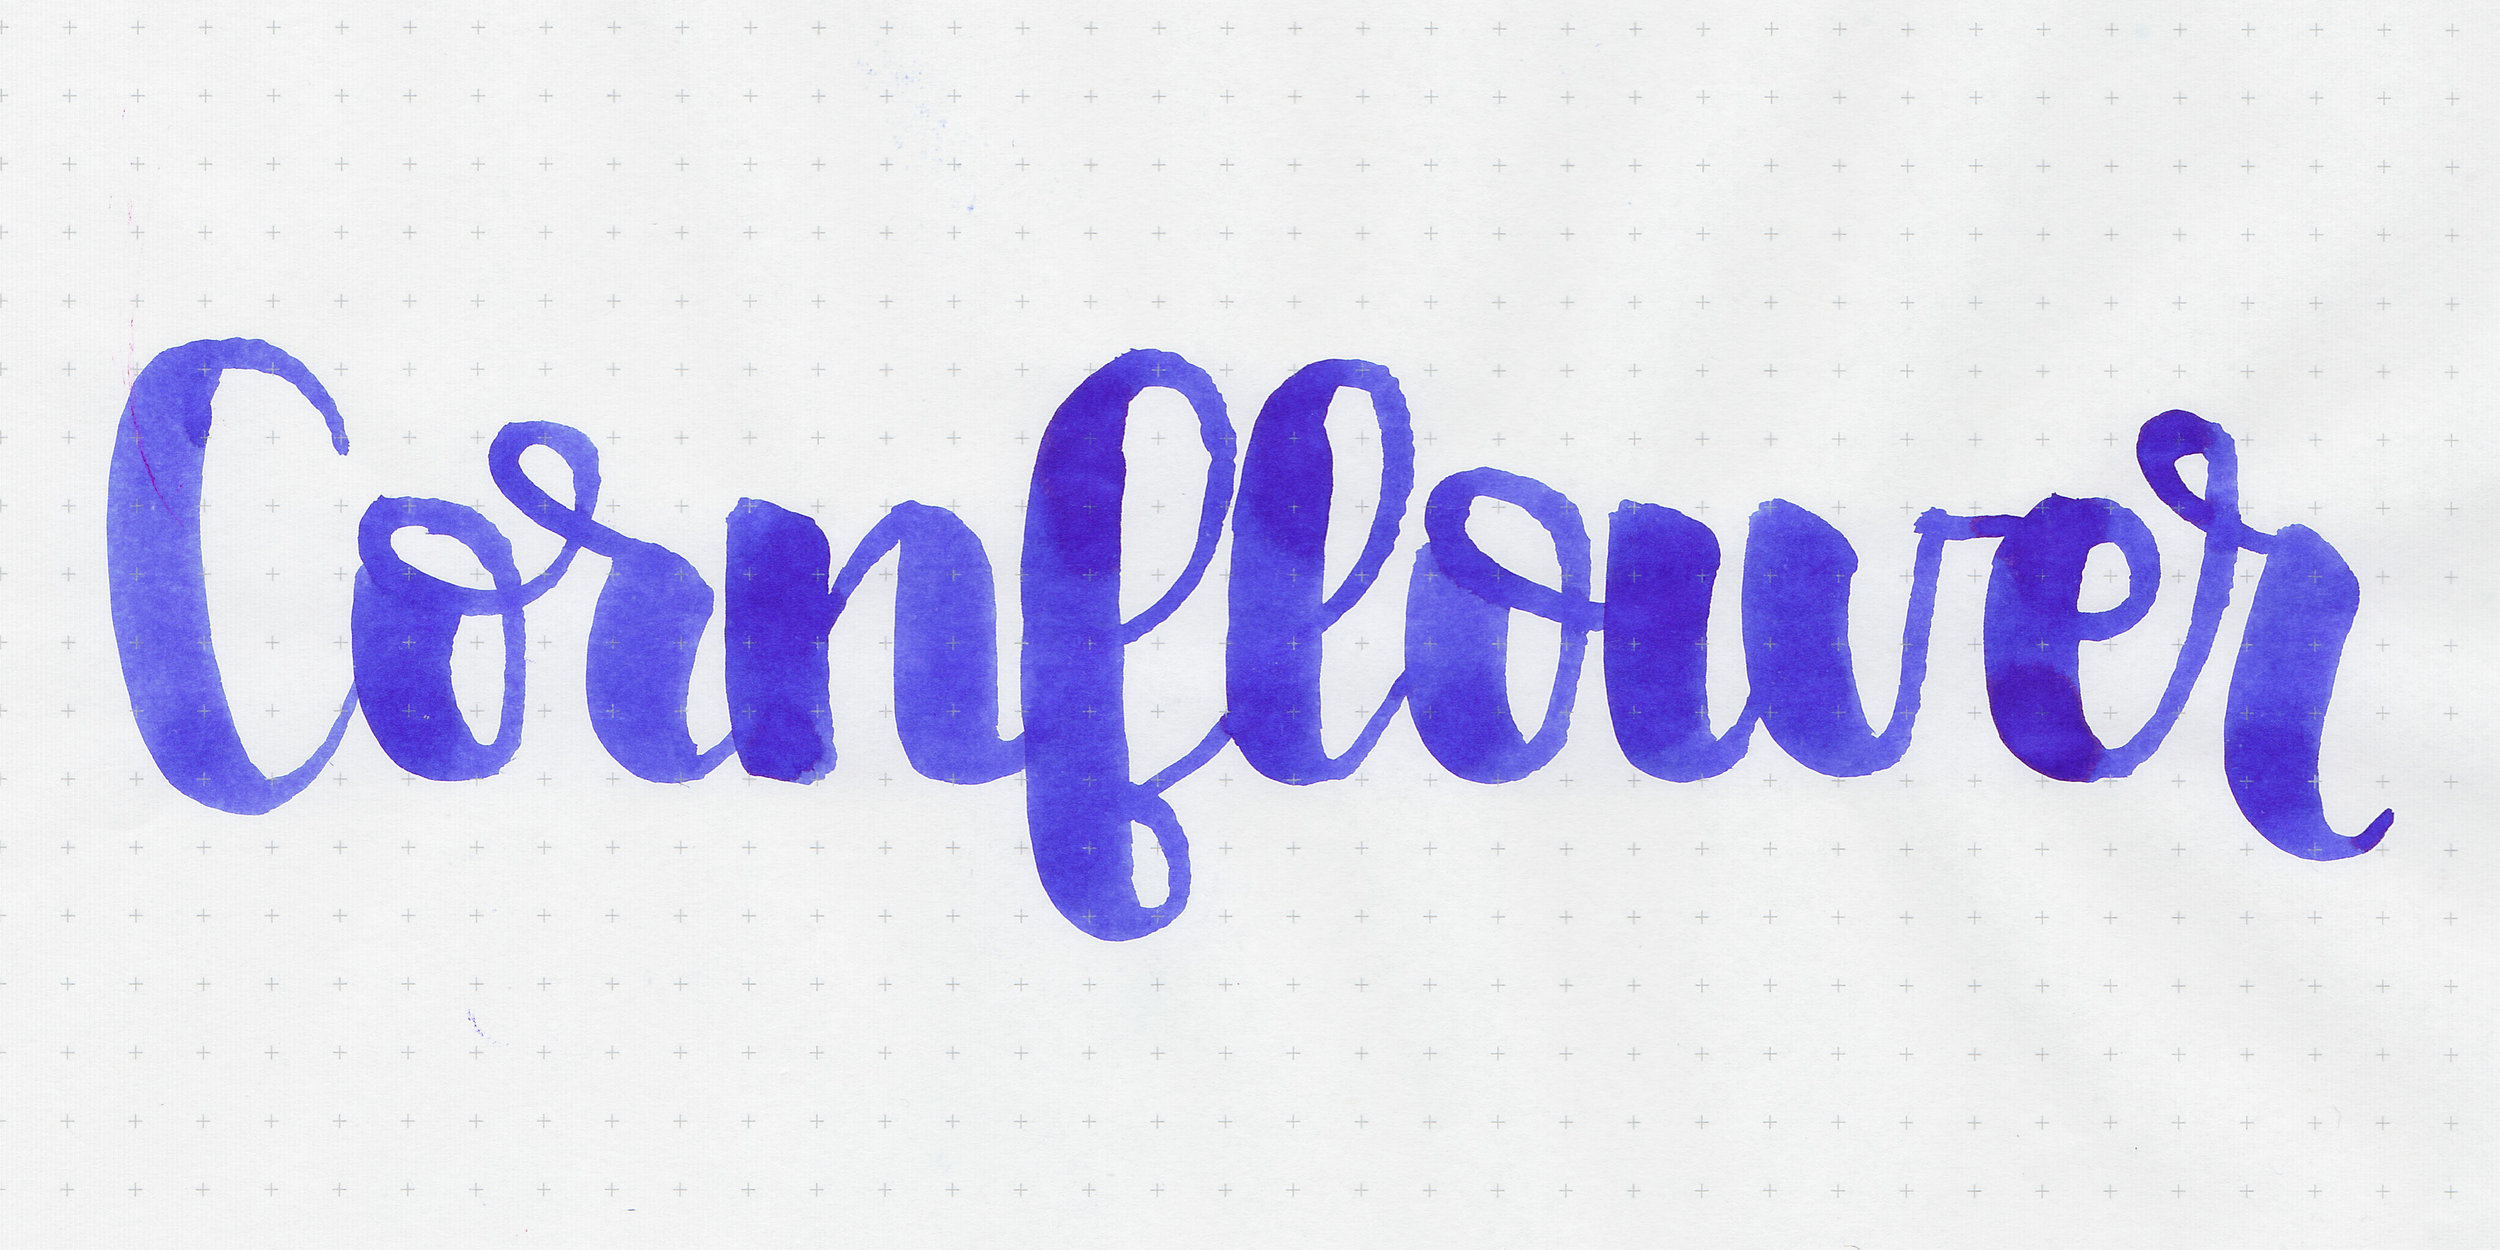 d-cornflower-2.jpg